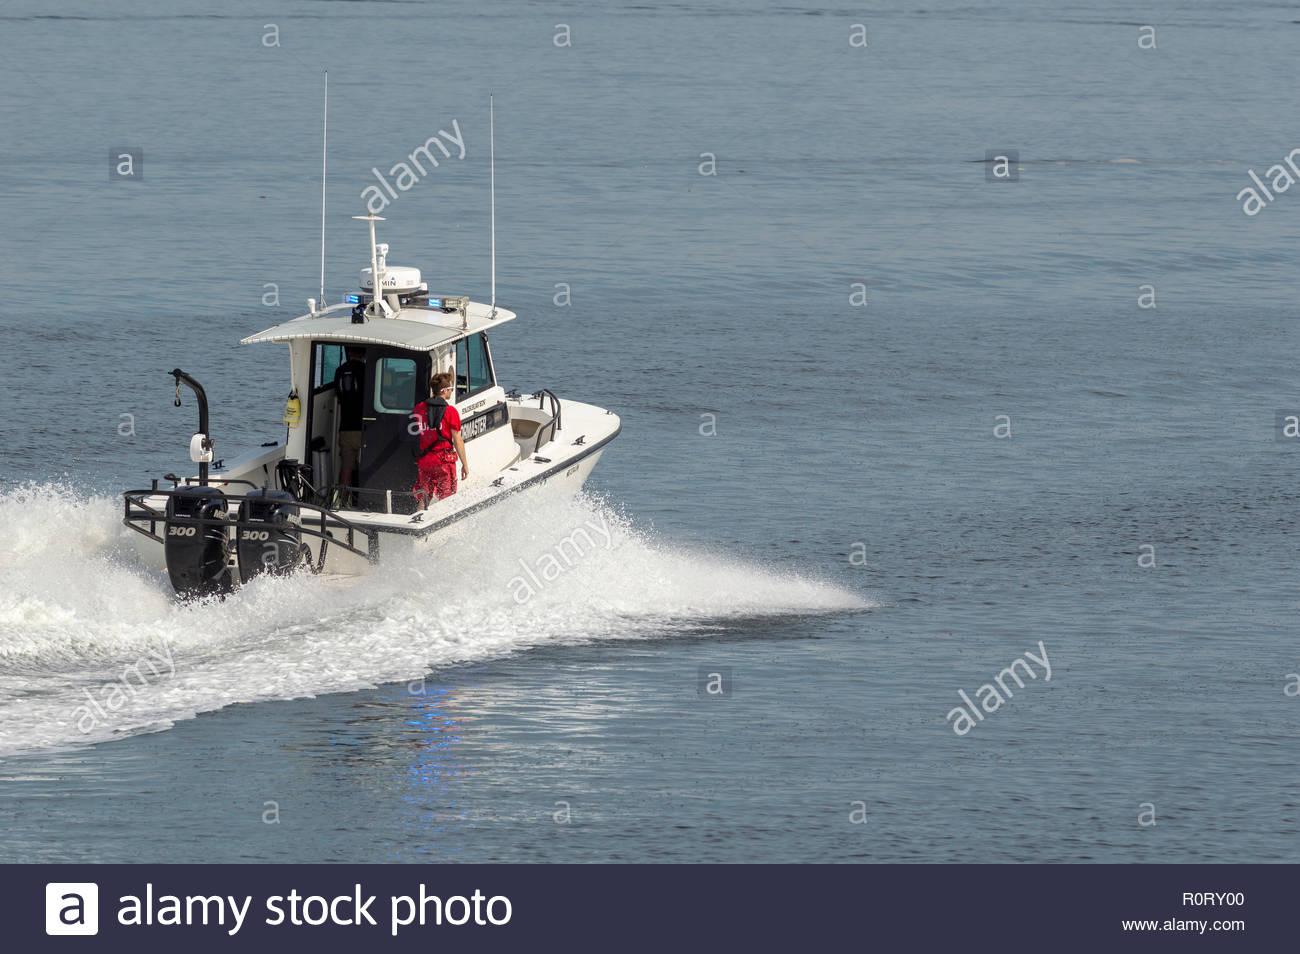 Fairhaven, Massachusetts, USA - June 30, 2018: Fairhaven Harbormaster boat crossing Acushnet River toward Fairhaven waterfront - Stock Image